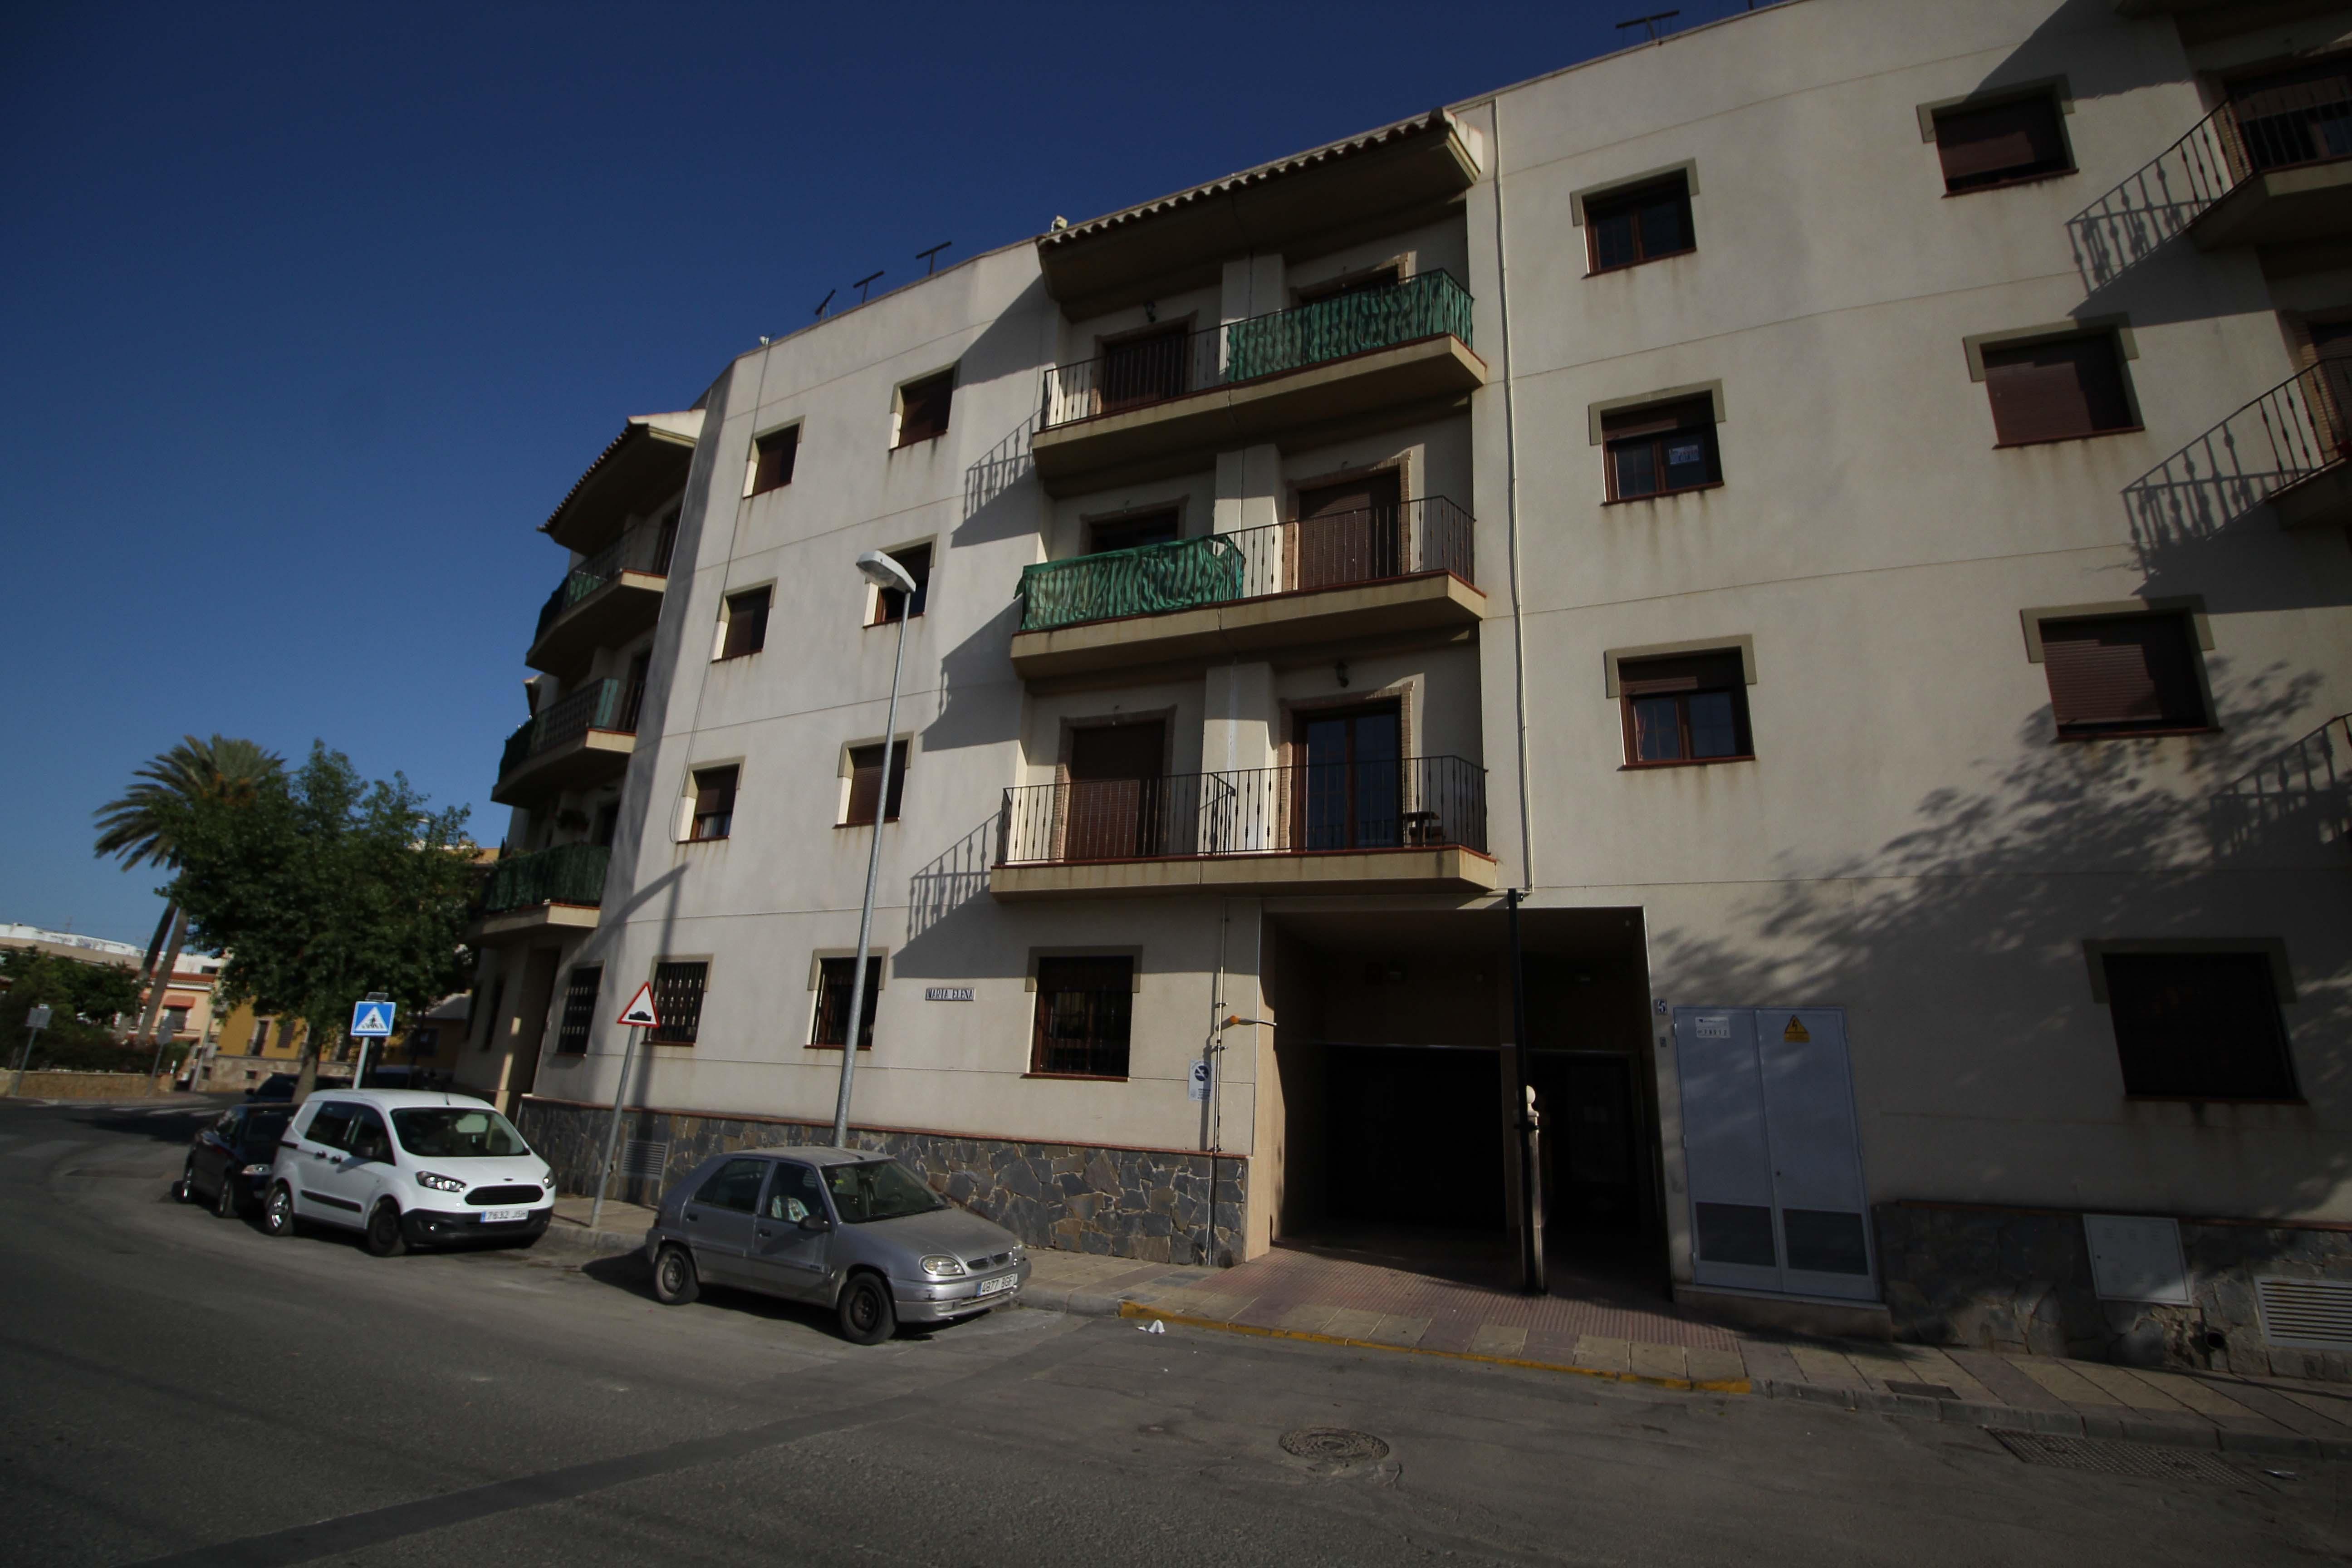 Apartment. Ctra. Ballabona. Cuevas del Almanzora.